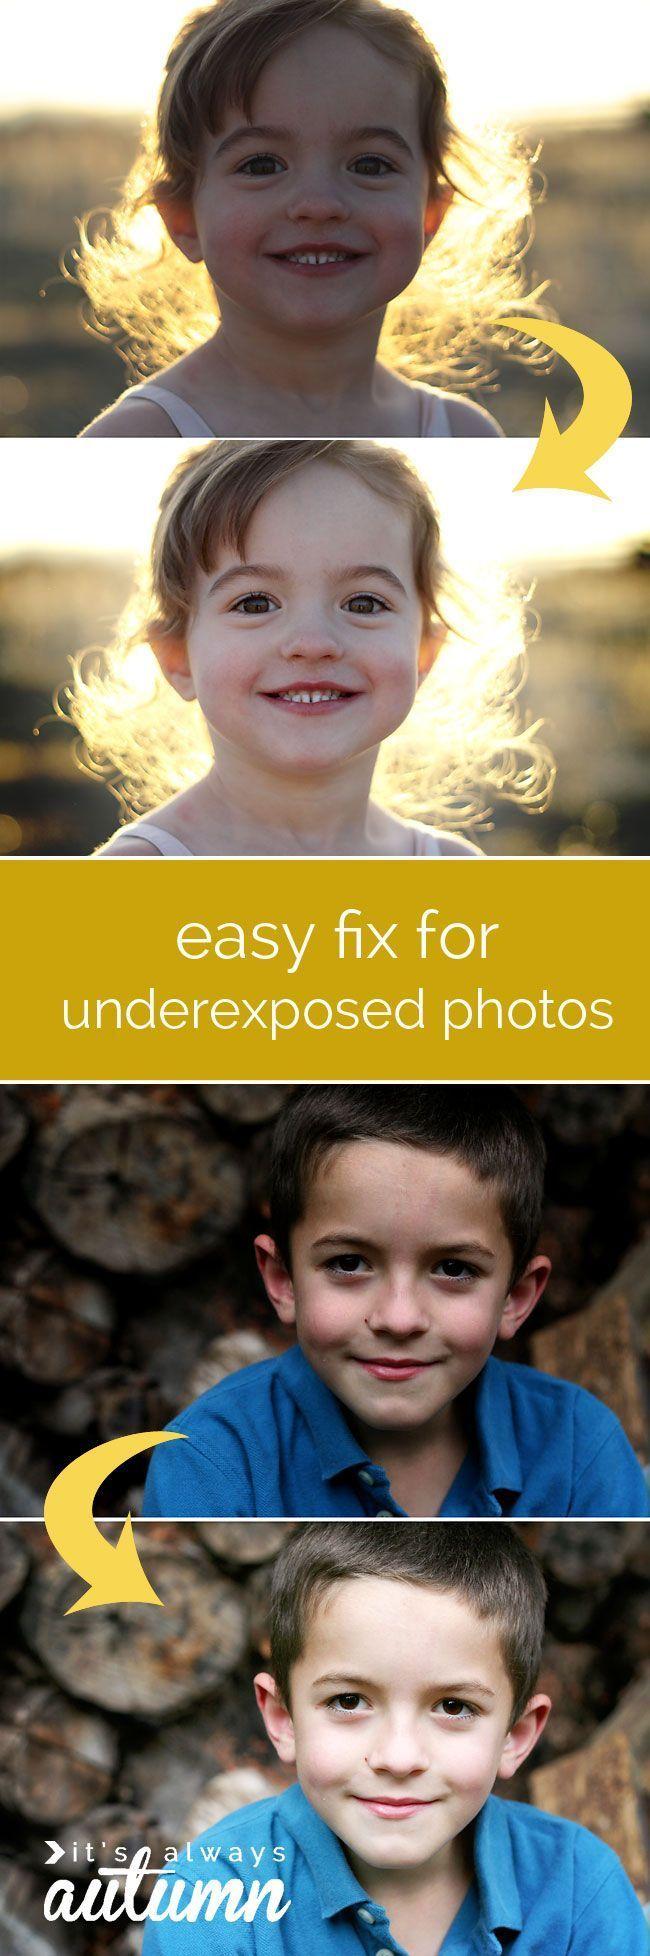 easy fix for dark or underexposed photos | simple photo edit - It's Always Autumn